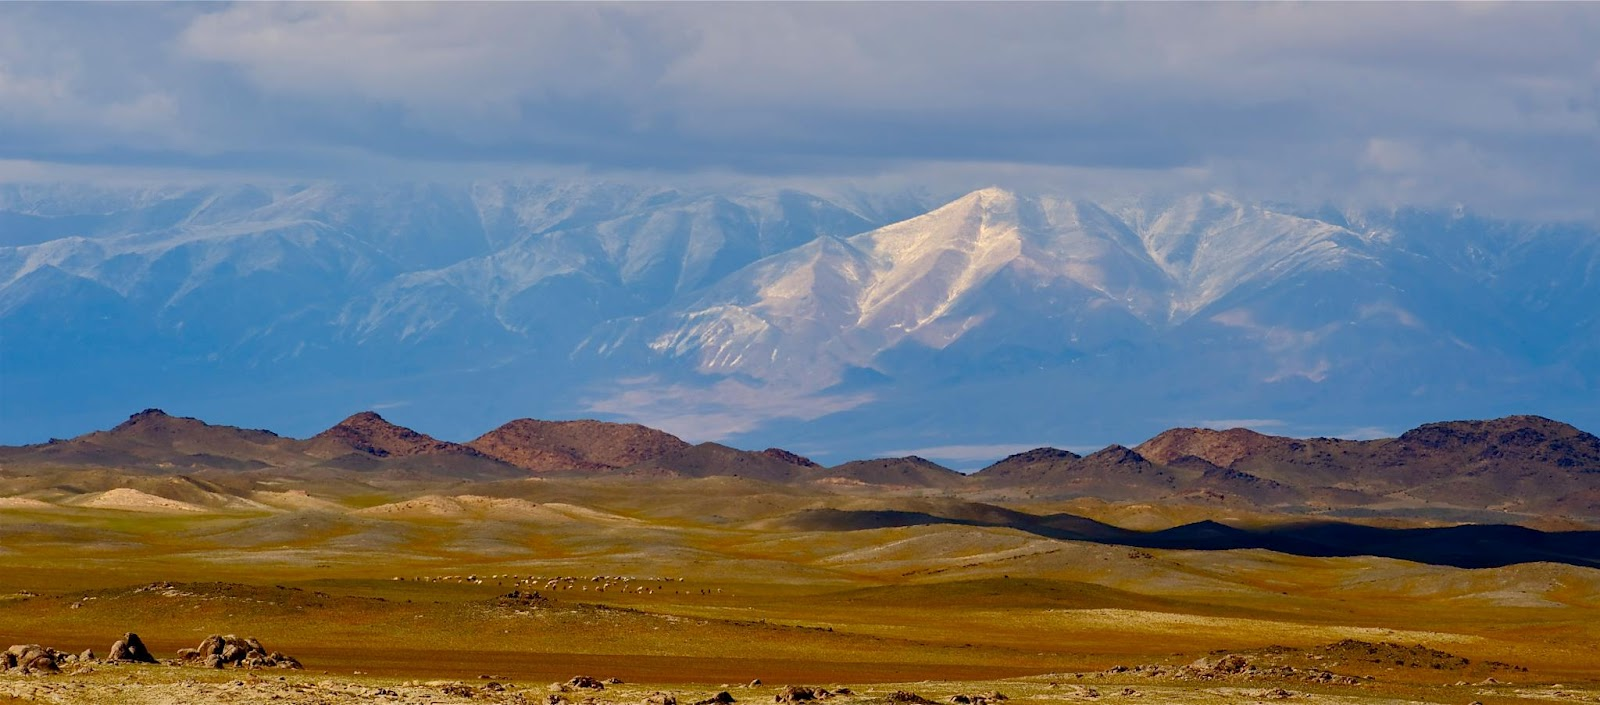 Ikh Bogd Mountain